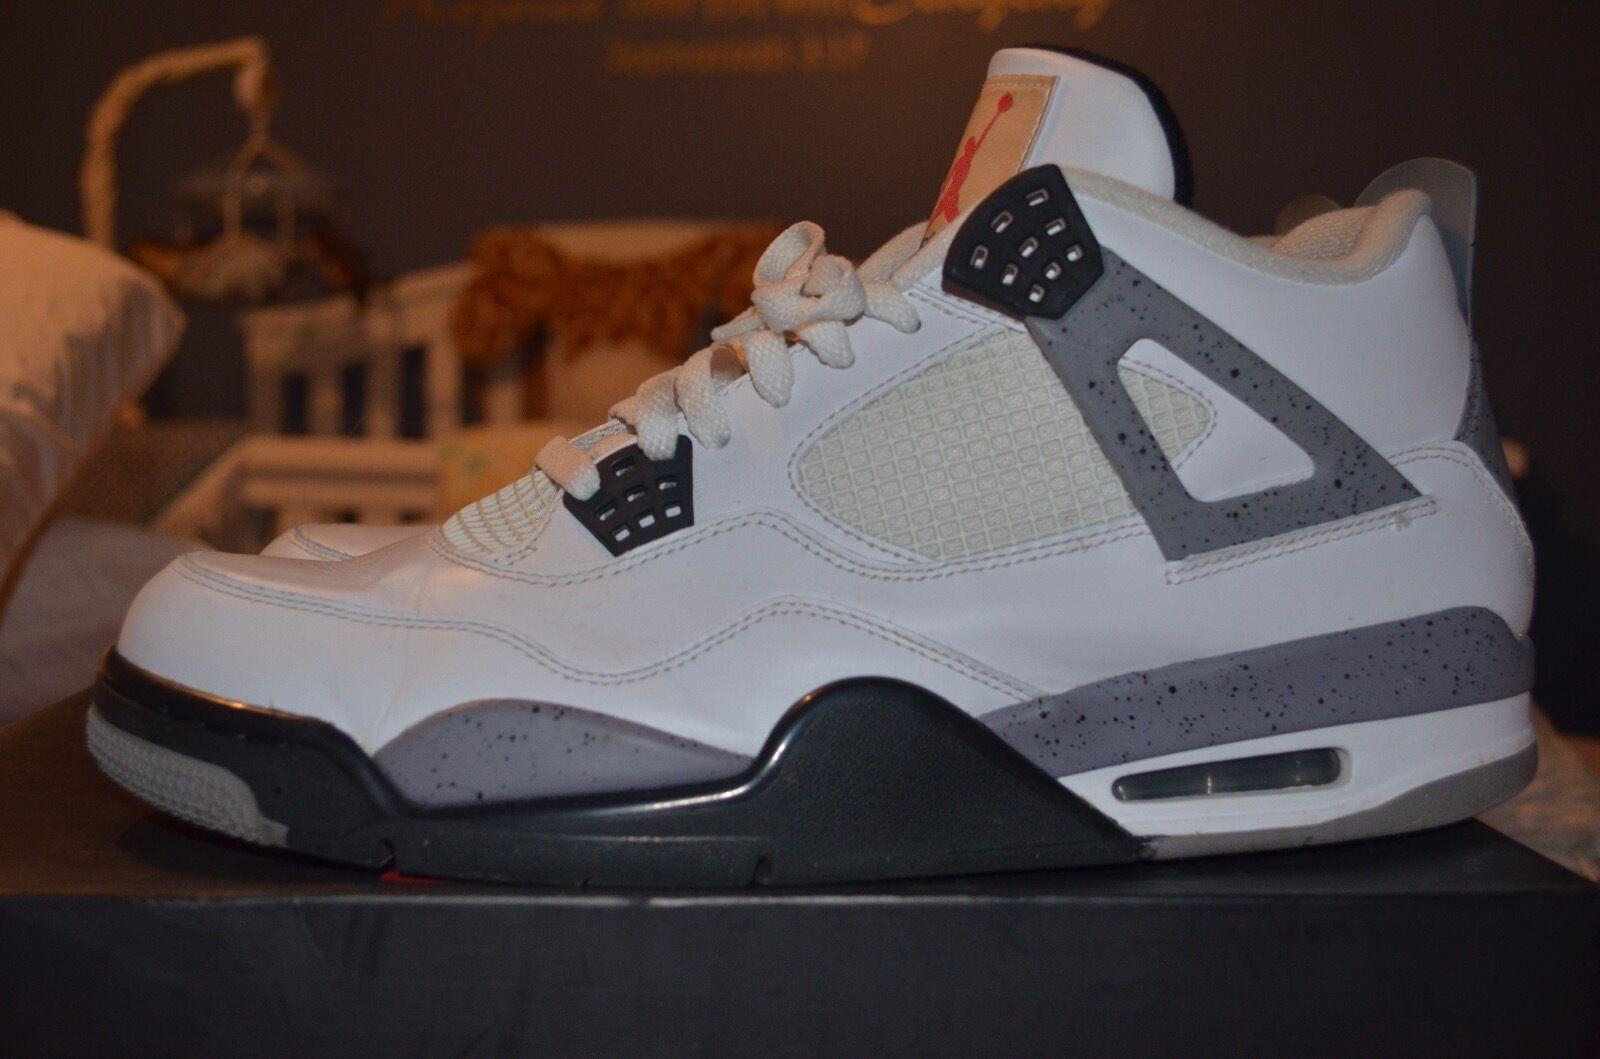 2012 Air Jordan Jordan Jordan Cement IV's Größe 12 Excellent Condition 78dd27